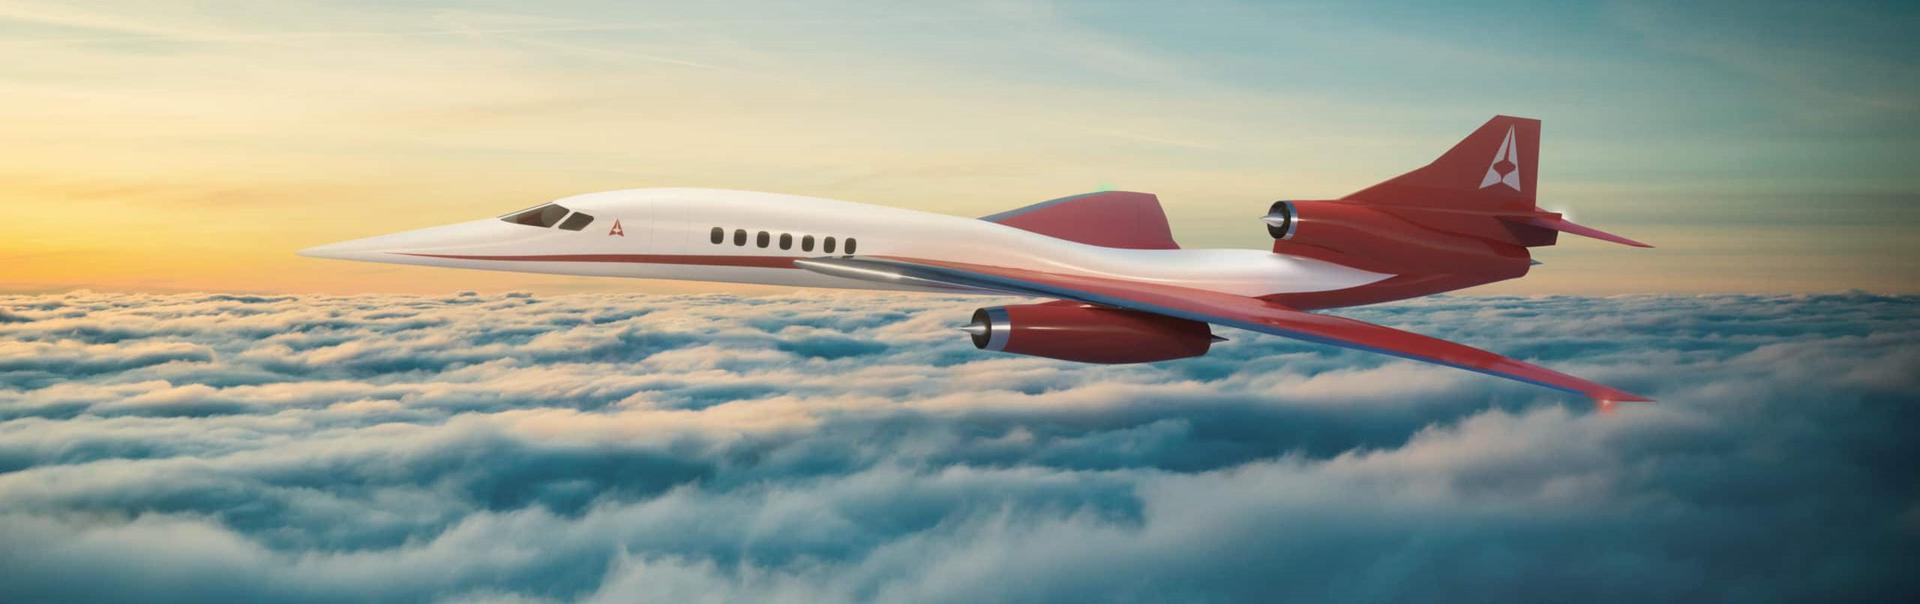 Aerion AS2 jet - Aerion illustration